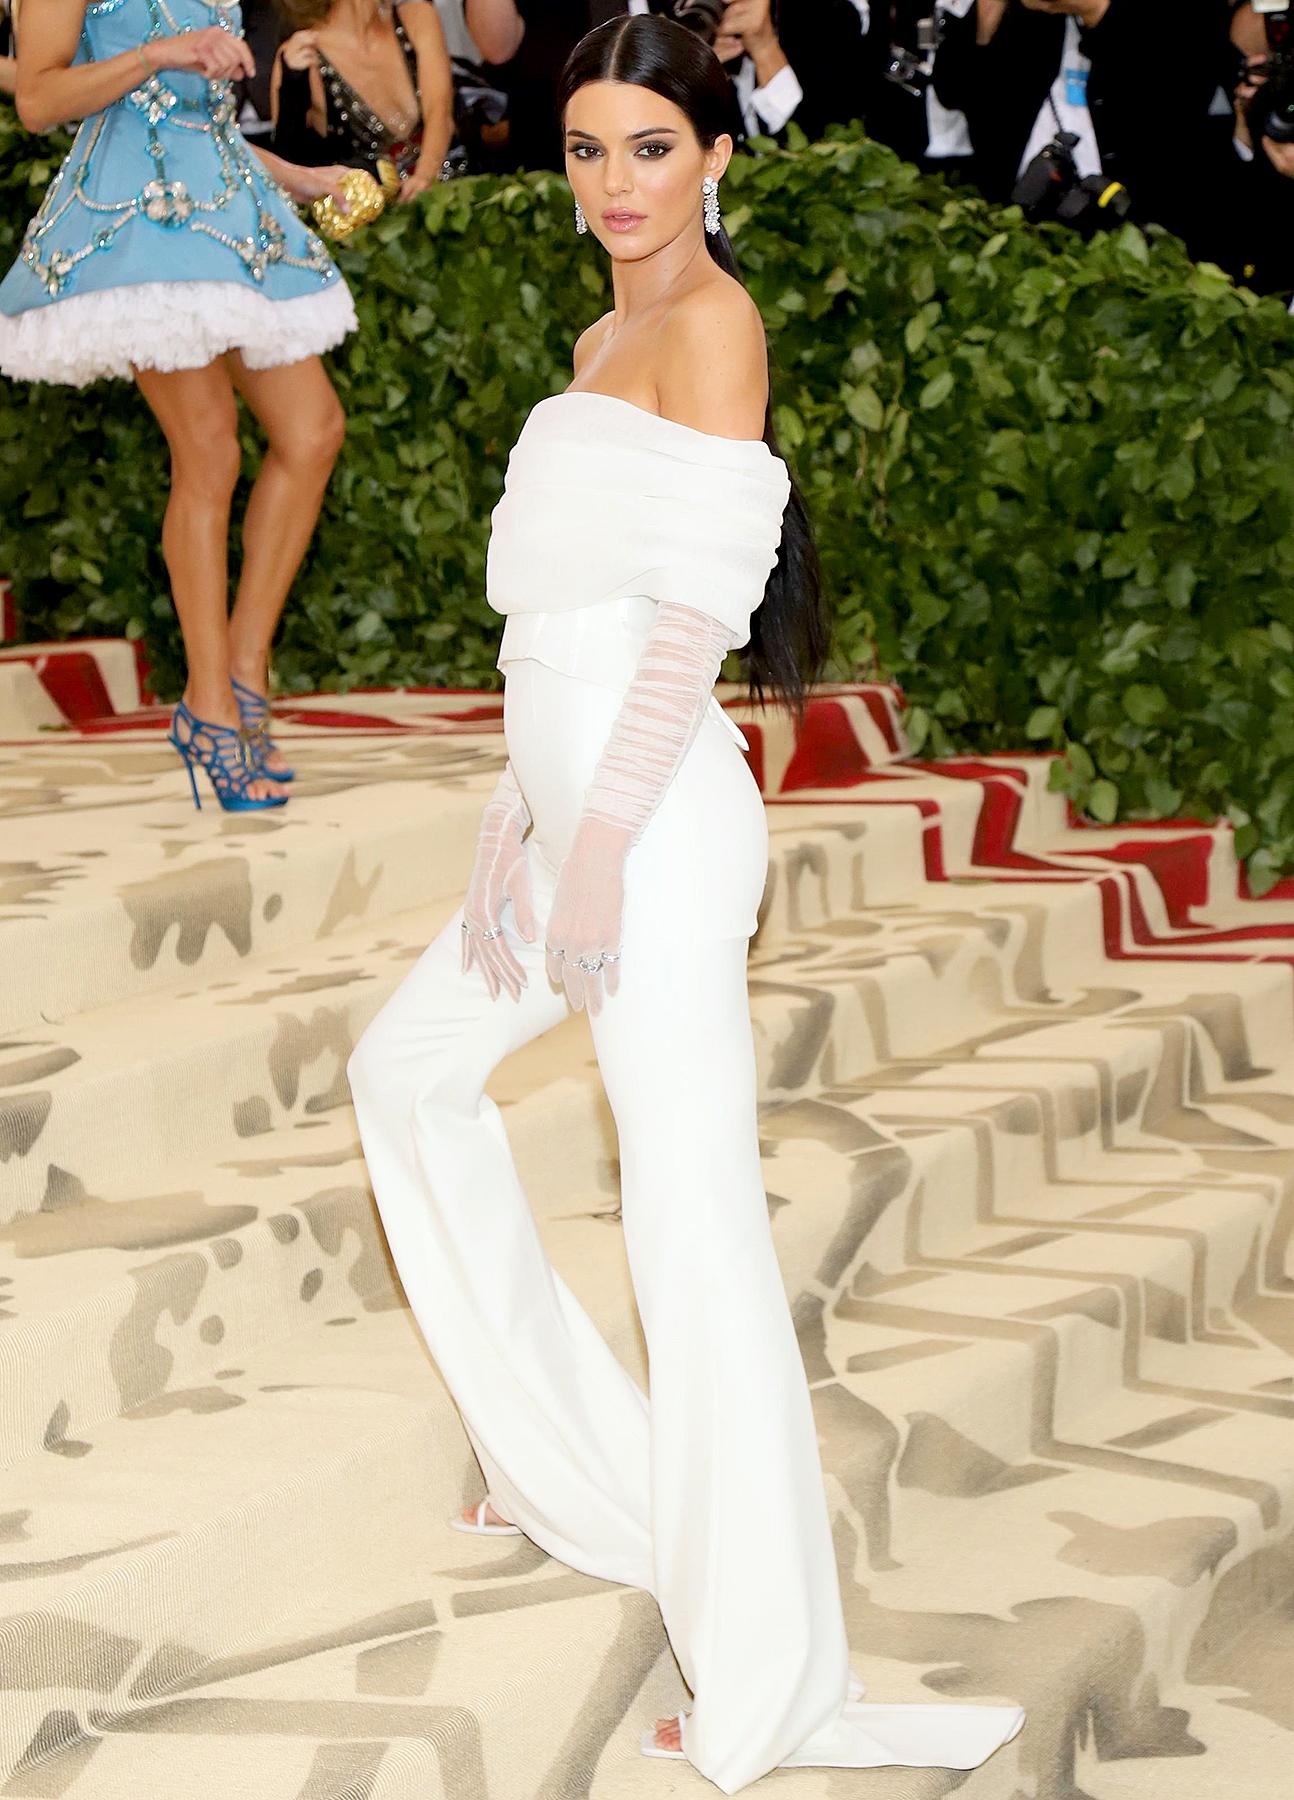 f8d313a66e7 Kendall Jenner's Best Red Carpet Fashion: Dresses, Suits, Pants